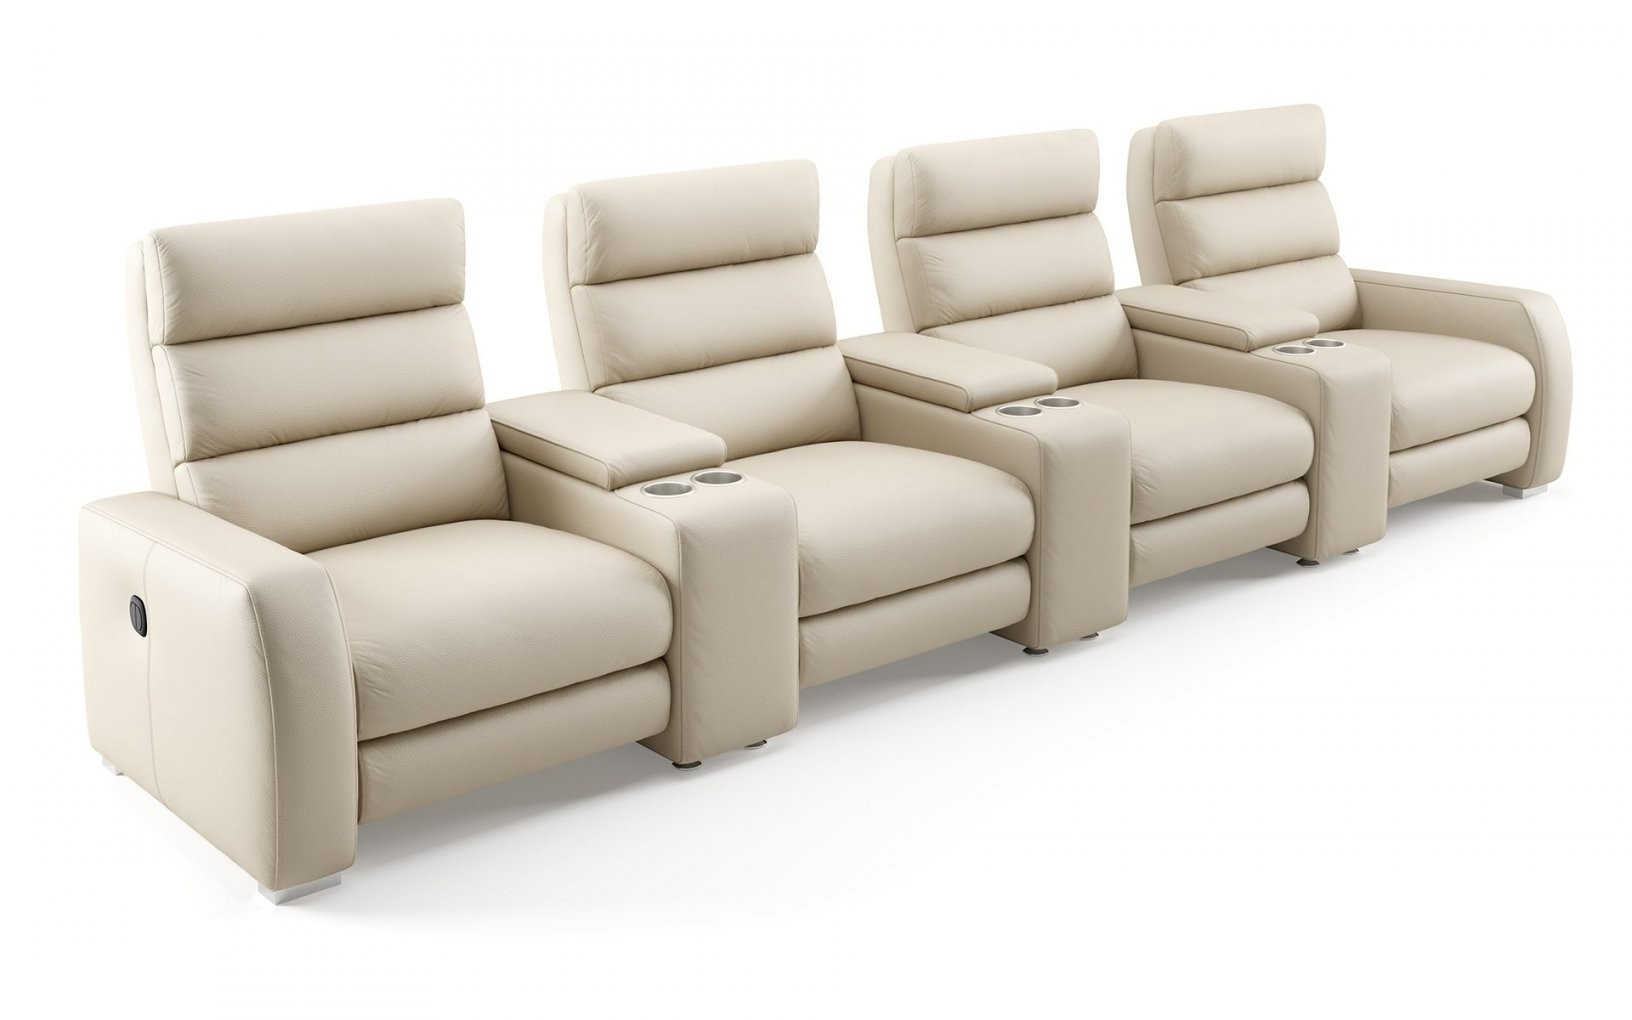 Sofa 4 Sitzer Leder  Haus Ideen von Sofa 4 Sitzer Leder Photo